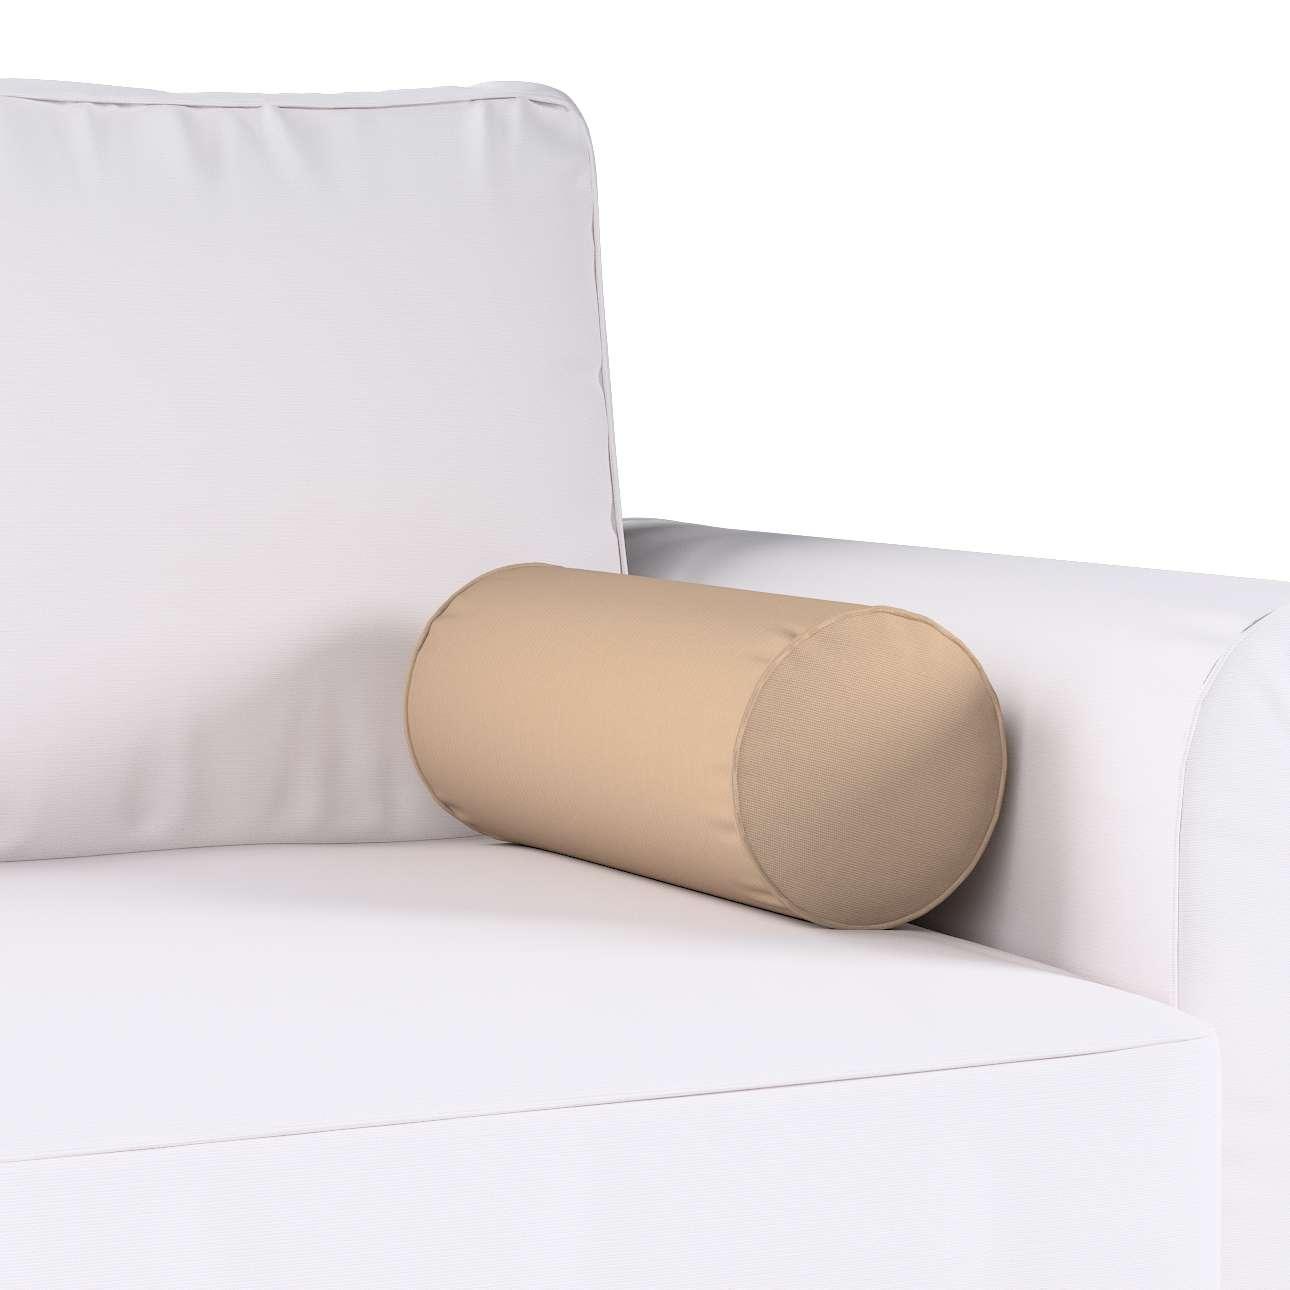 Valček jednoduchý V kolekcii Cotton Panama, tkanina: 702-28